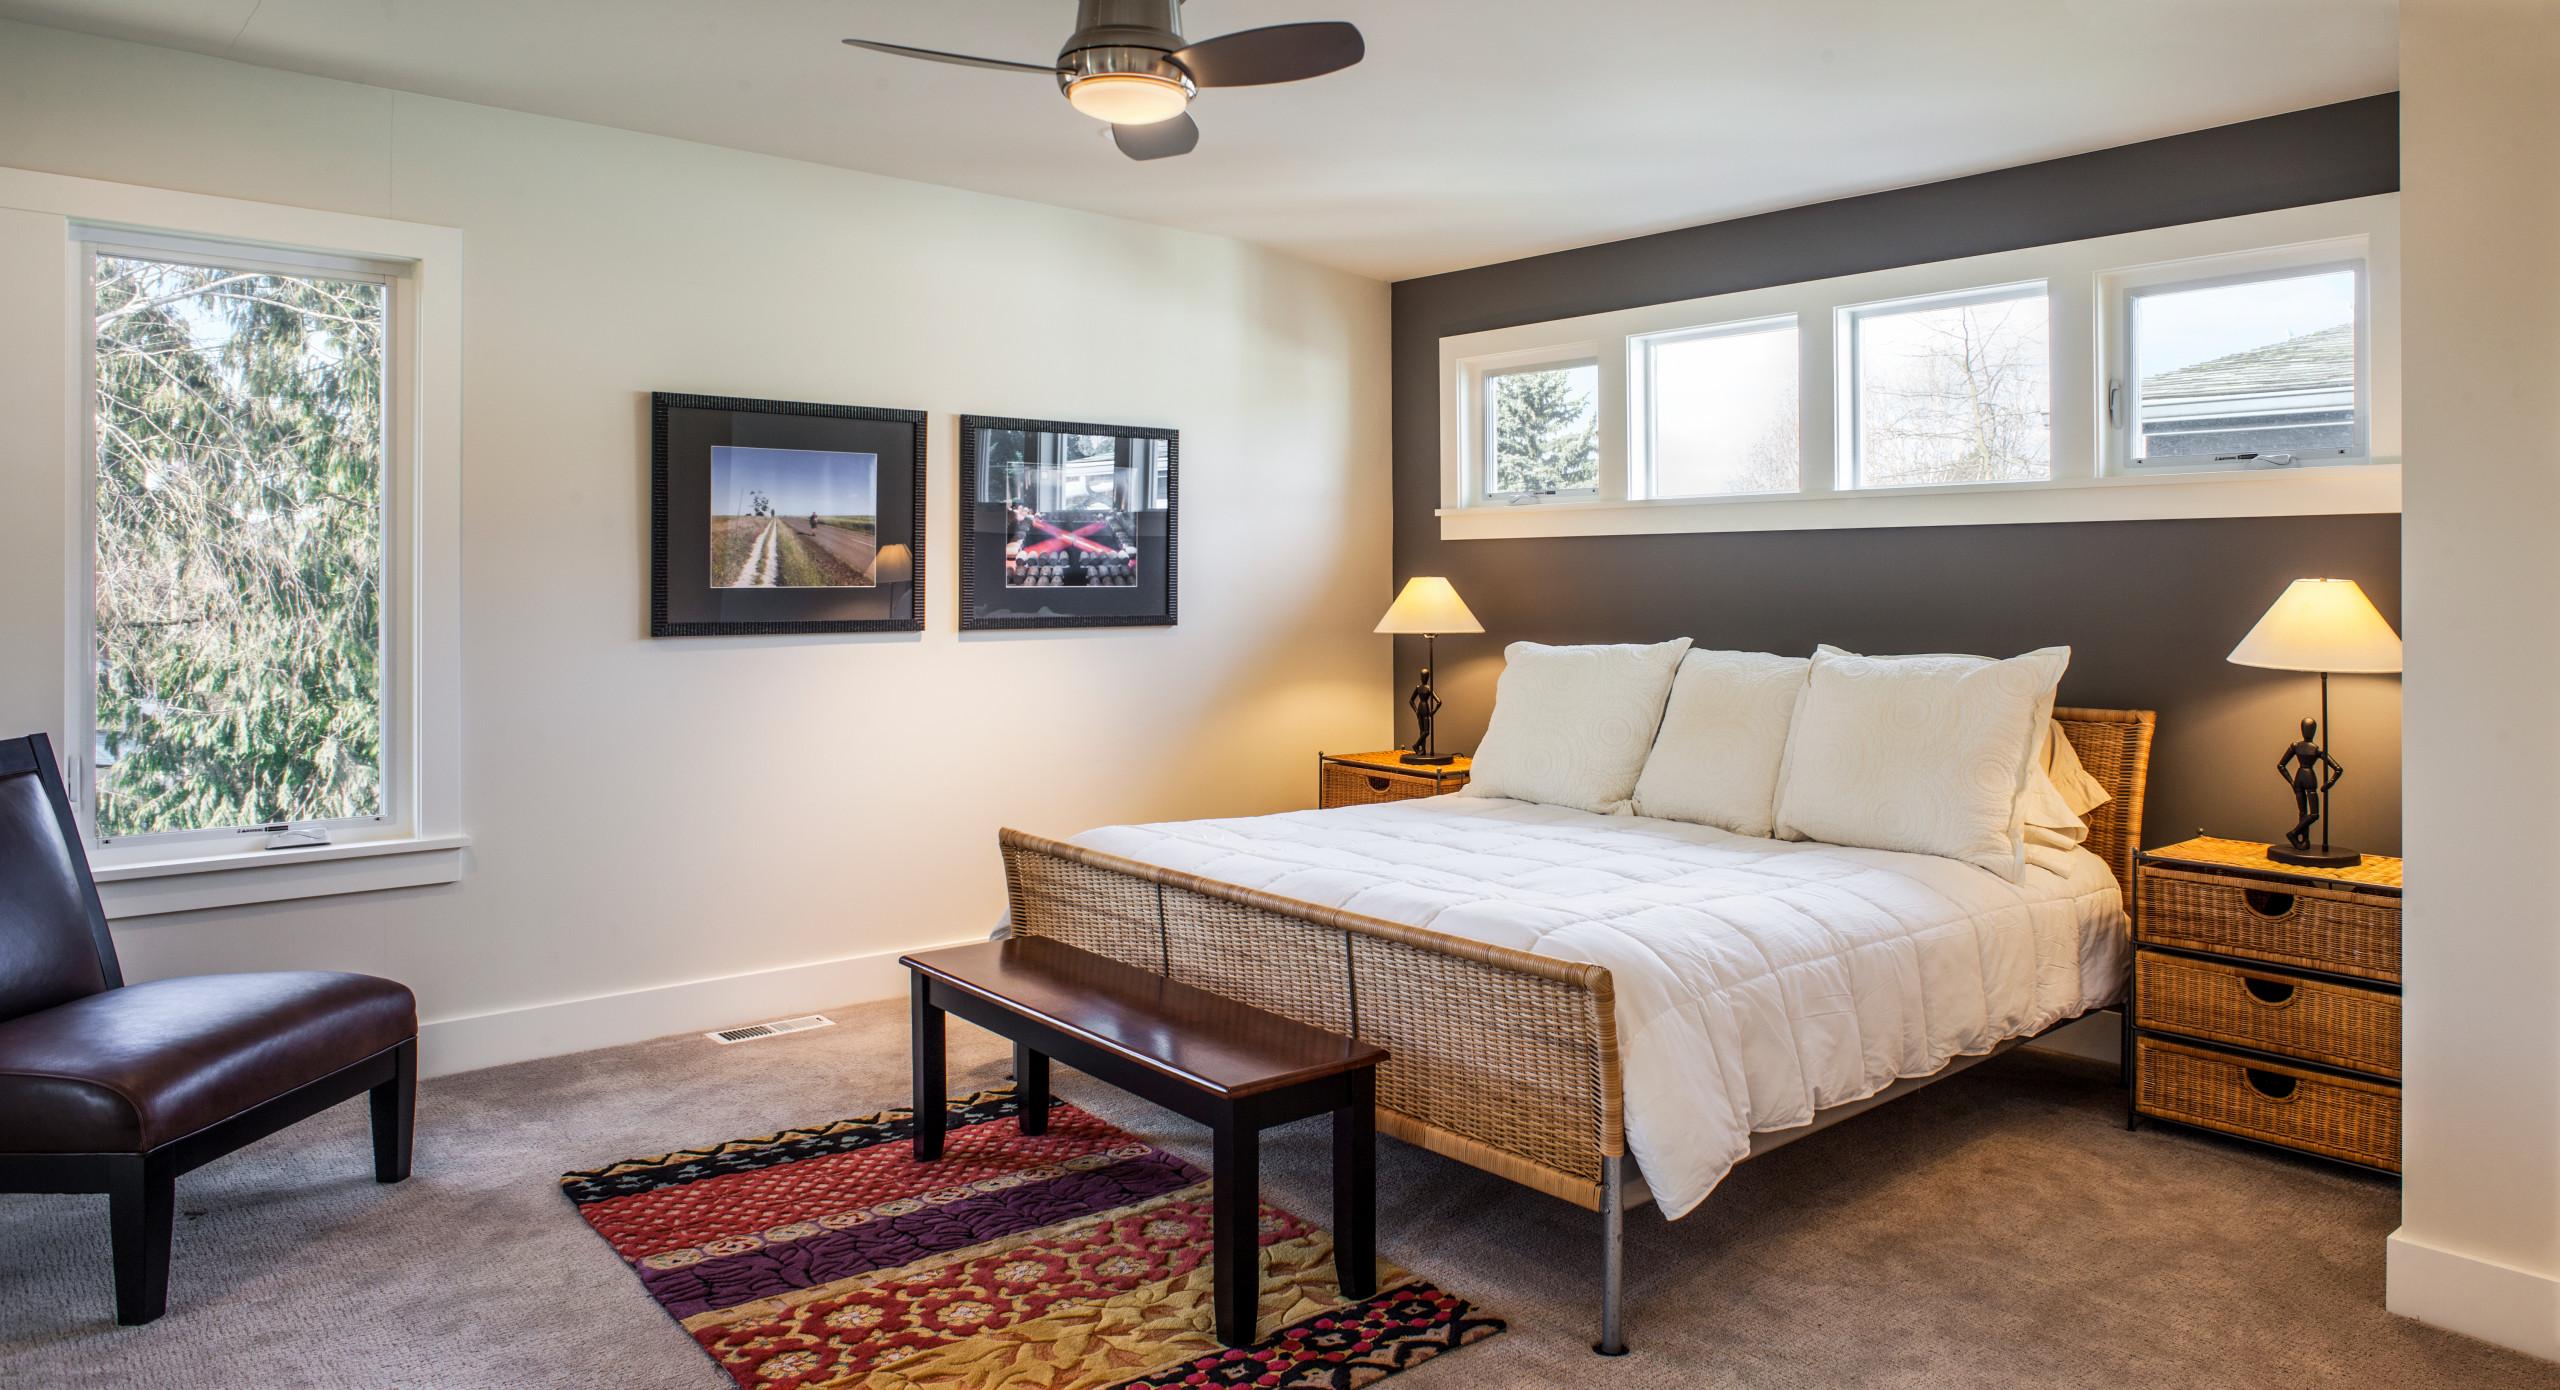 Craftsman / Modern Bedroom Update